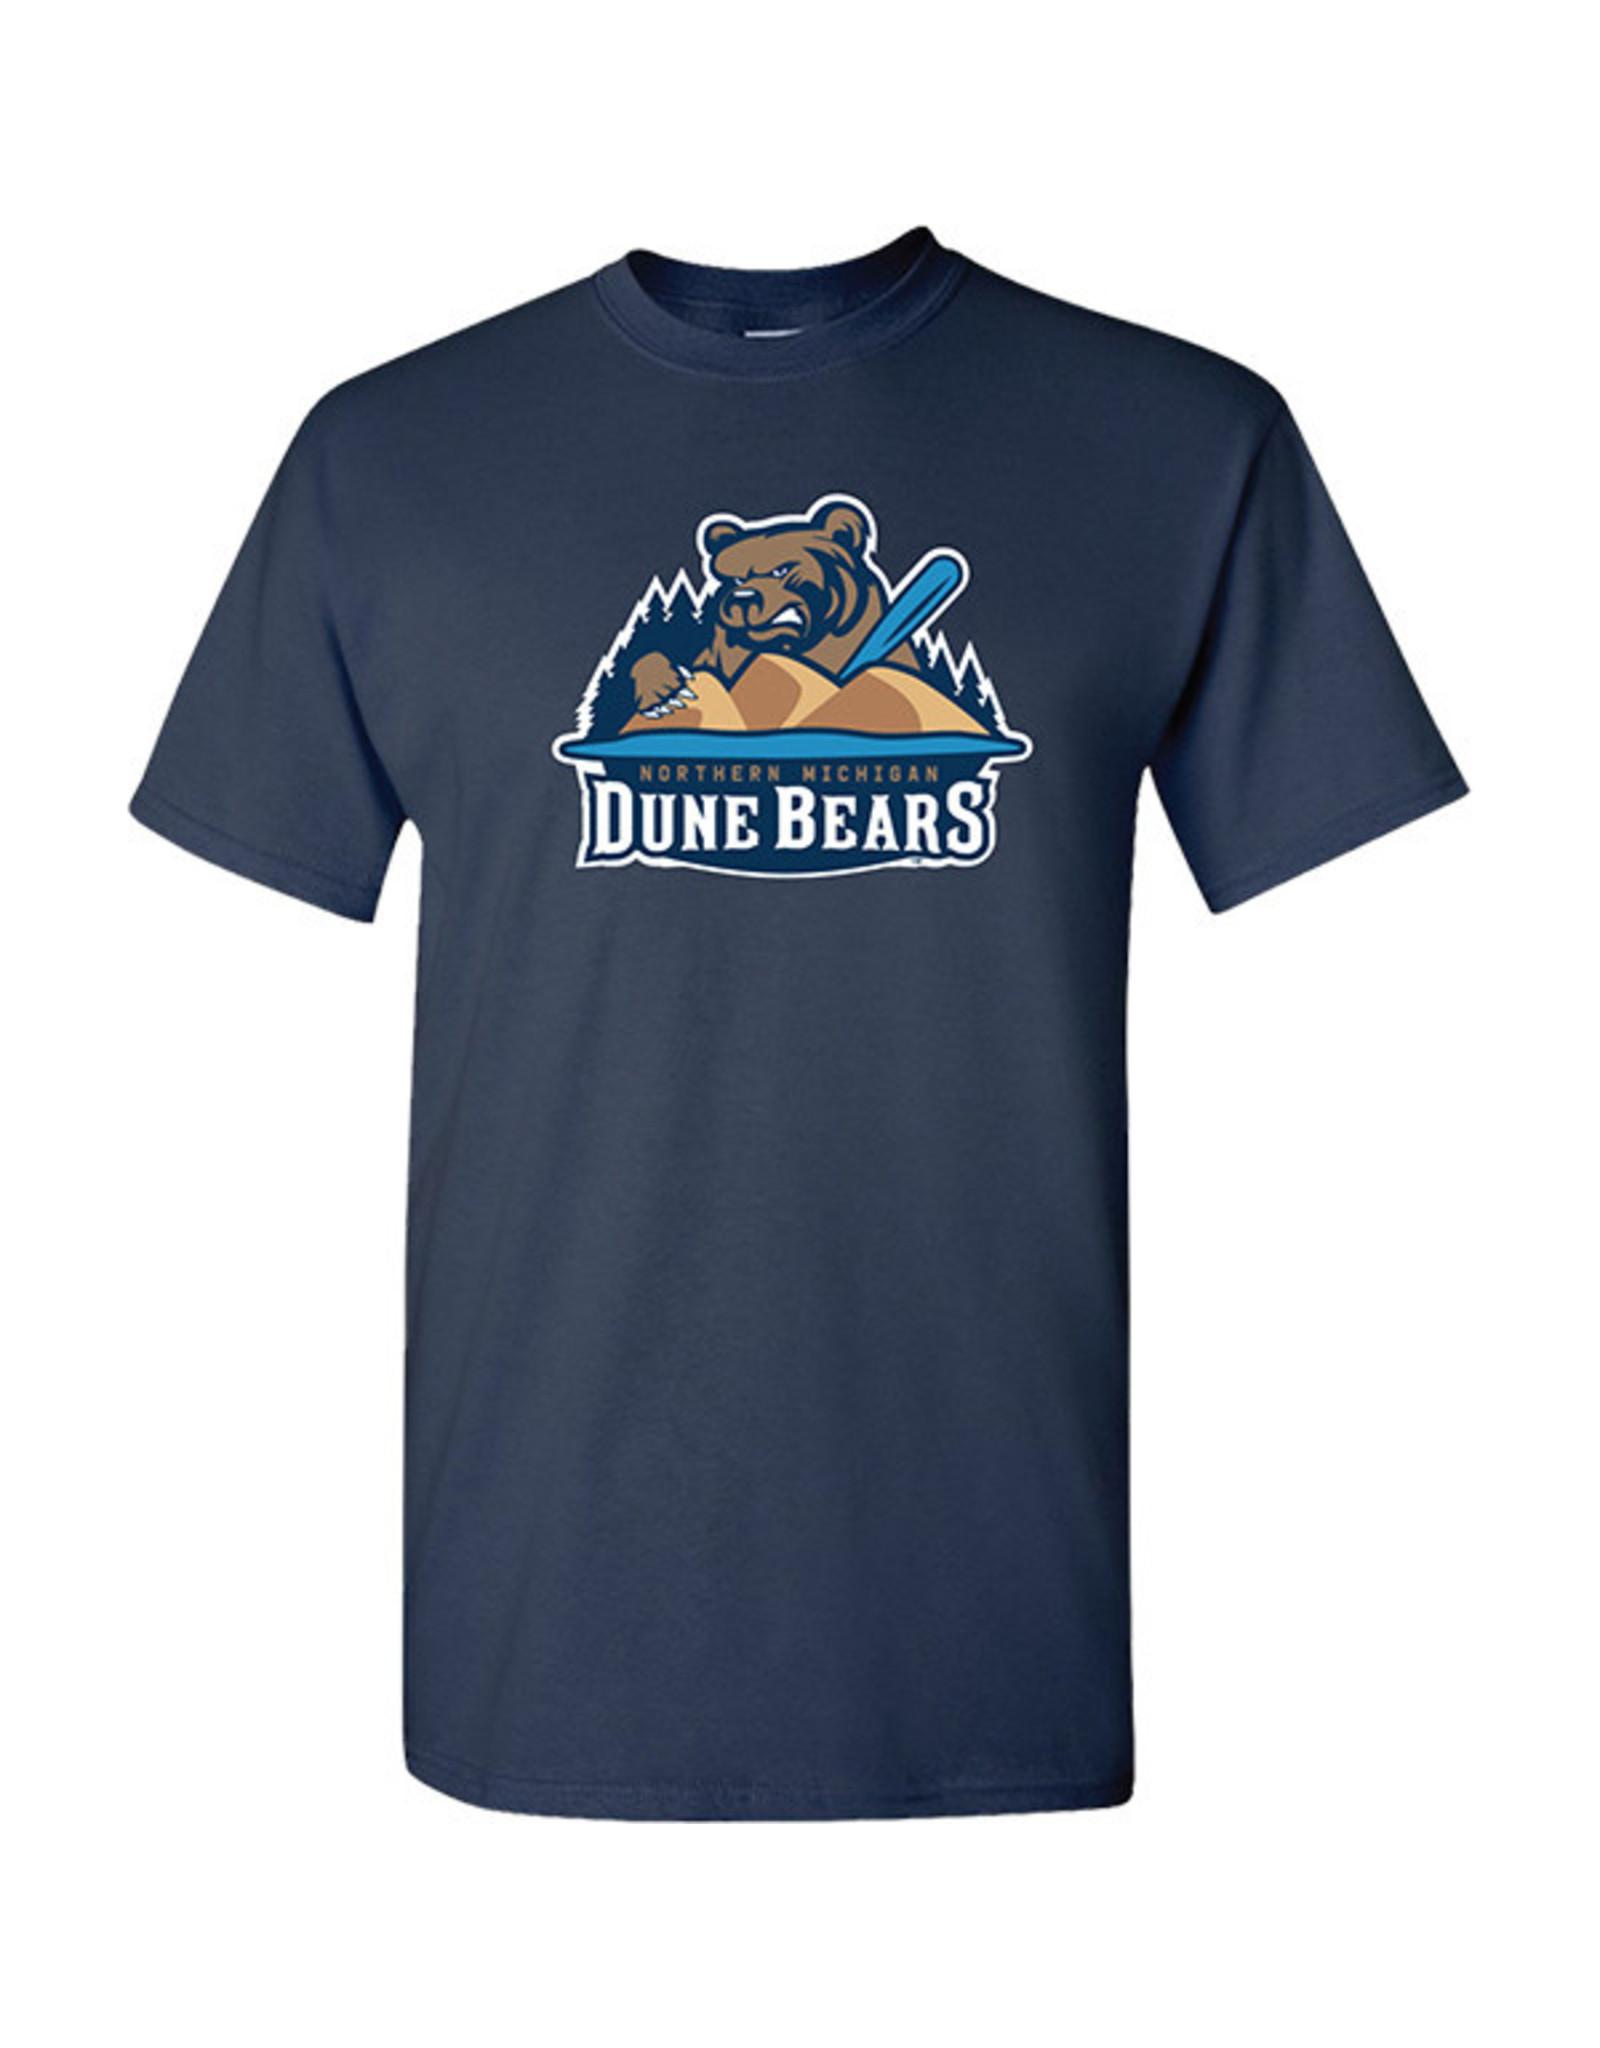 2530 Dune Bears Navy Tee